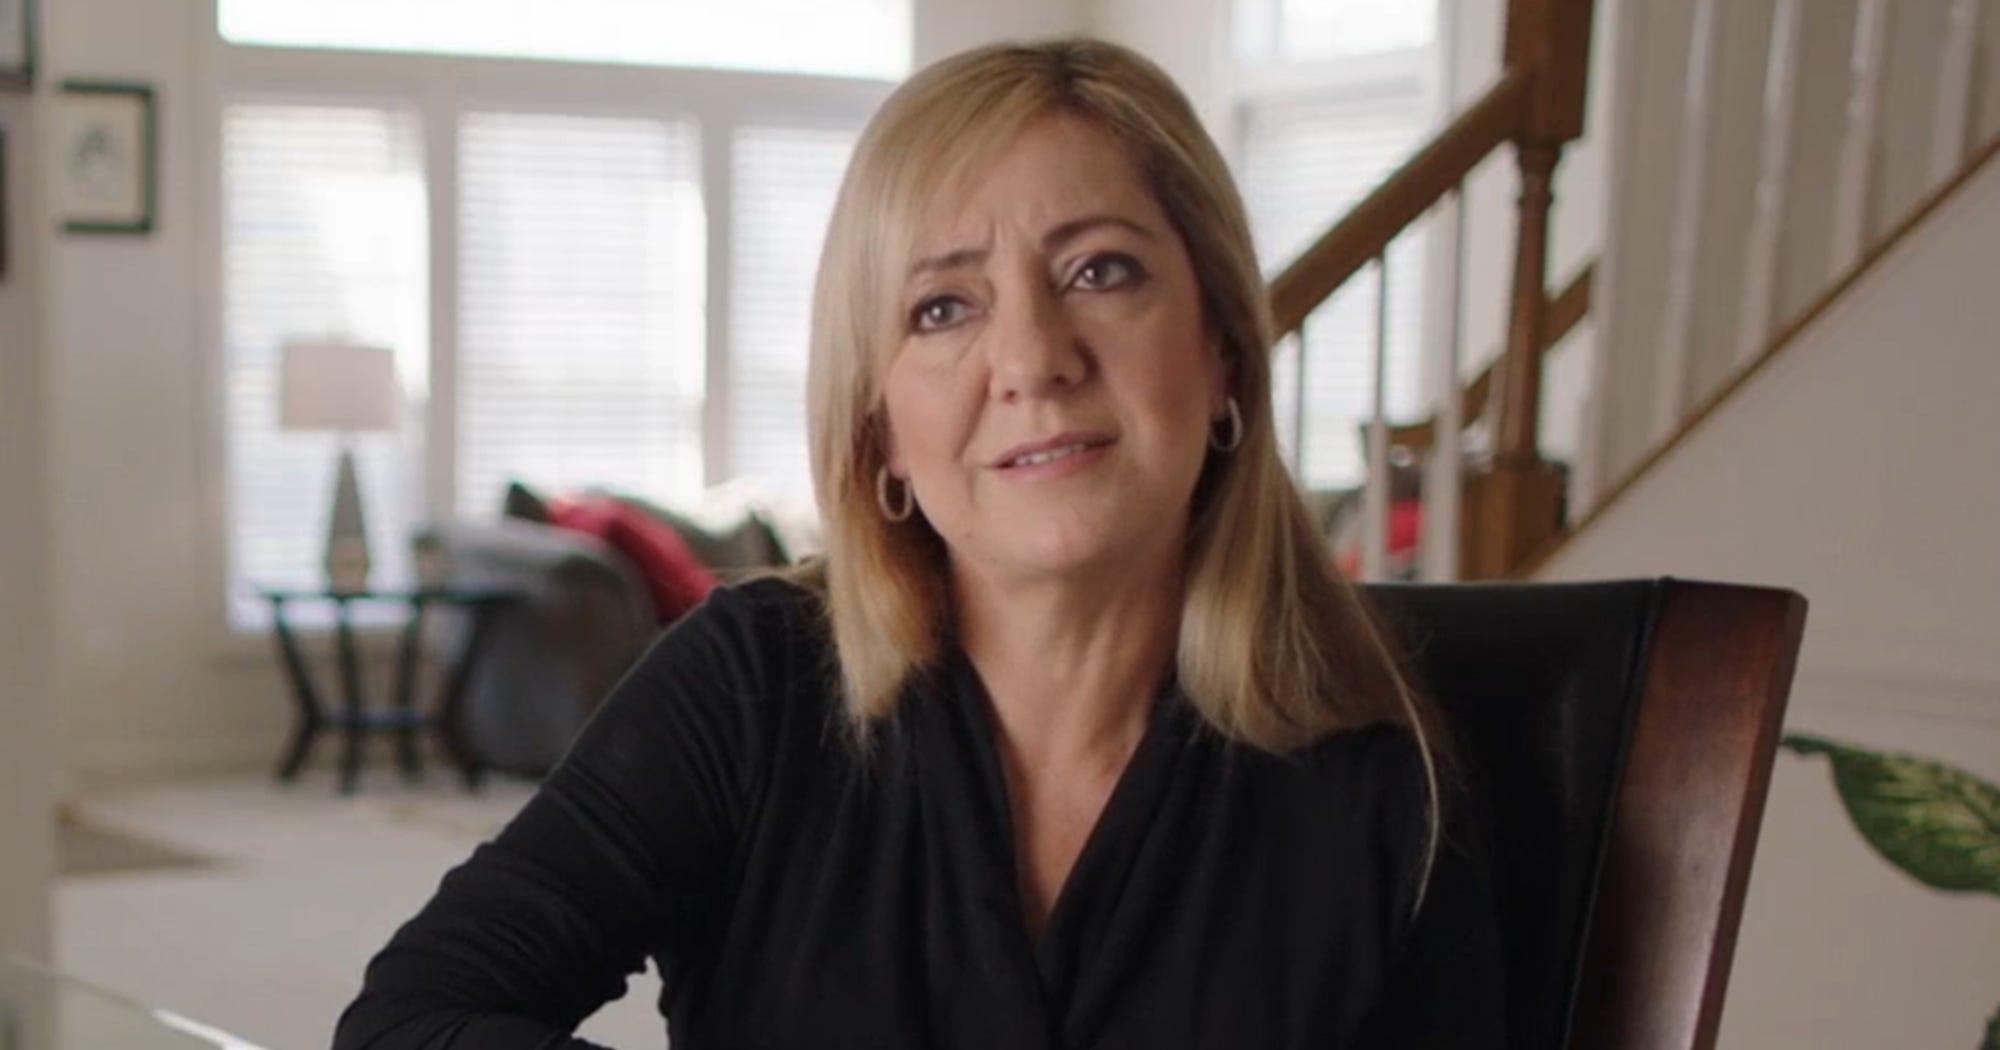 Lorena Bobbit: Where Is Lorena Bobbitt Now? Husband Castrater Update